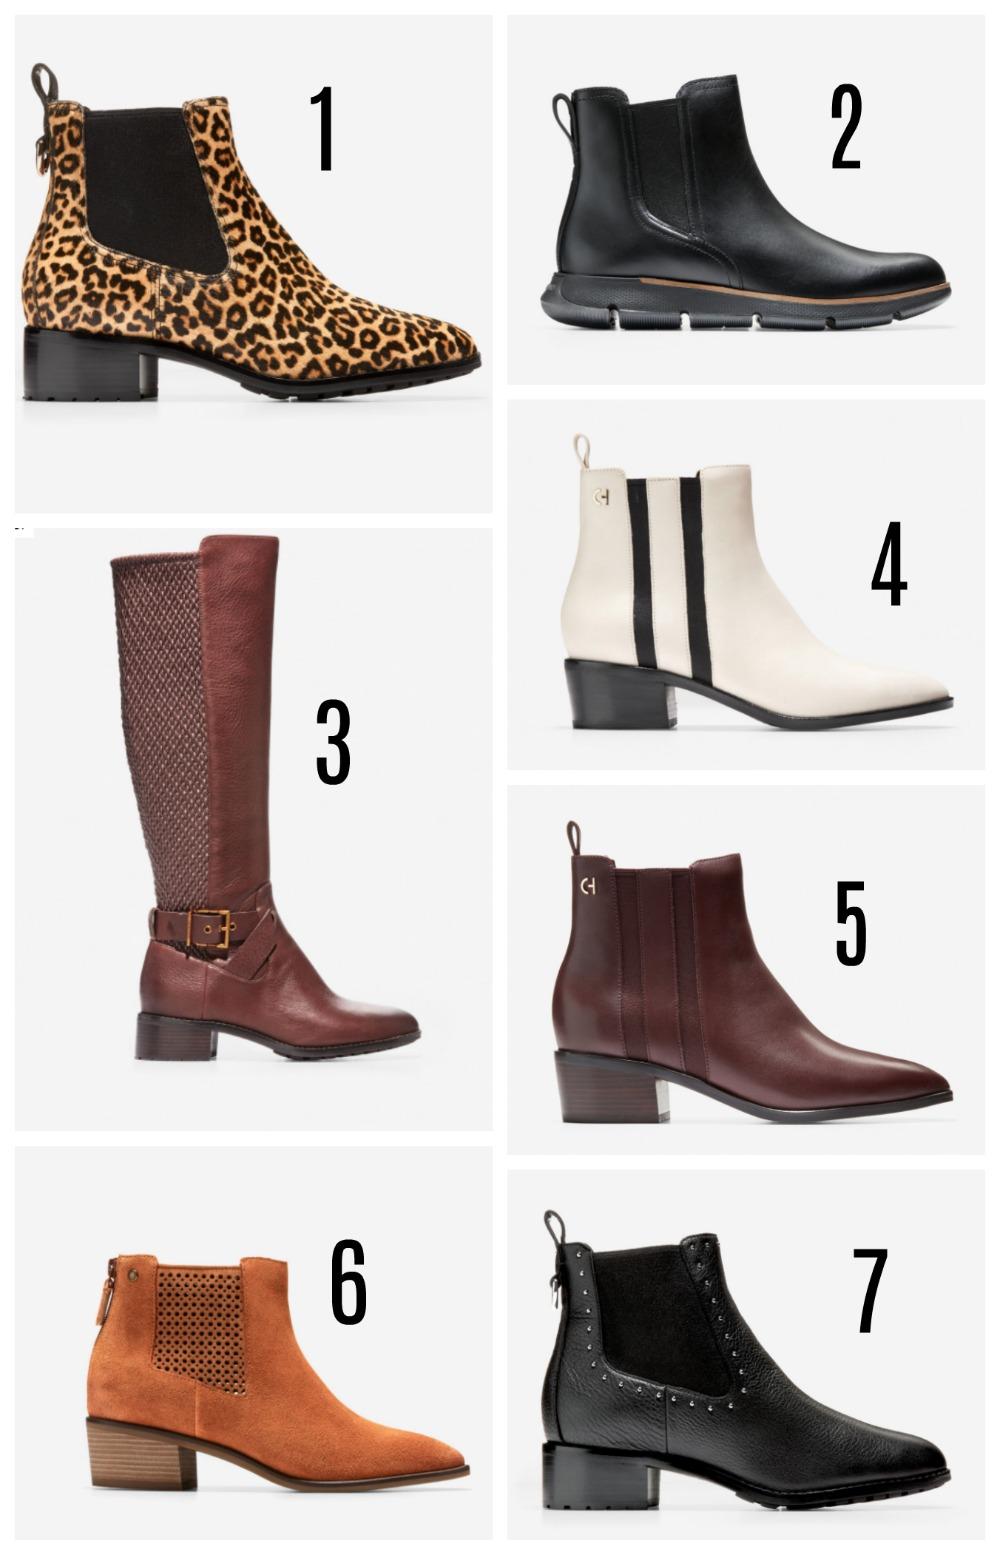 Fall 2020 Boots from COACH I Dreaminlace.com #womensfashion #COACHNY #fashionblog #fallfashion